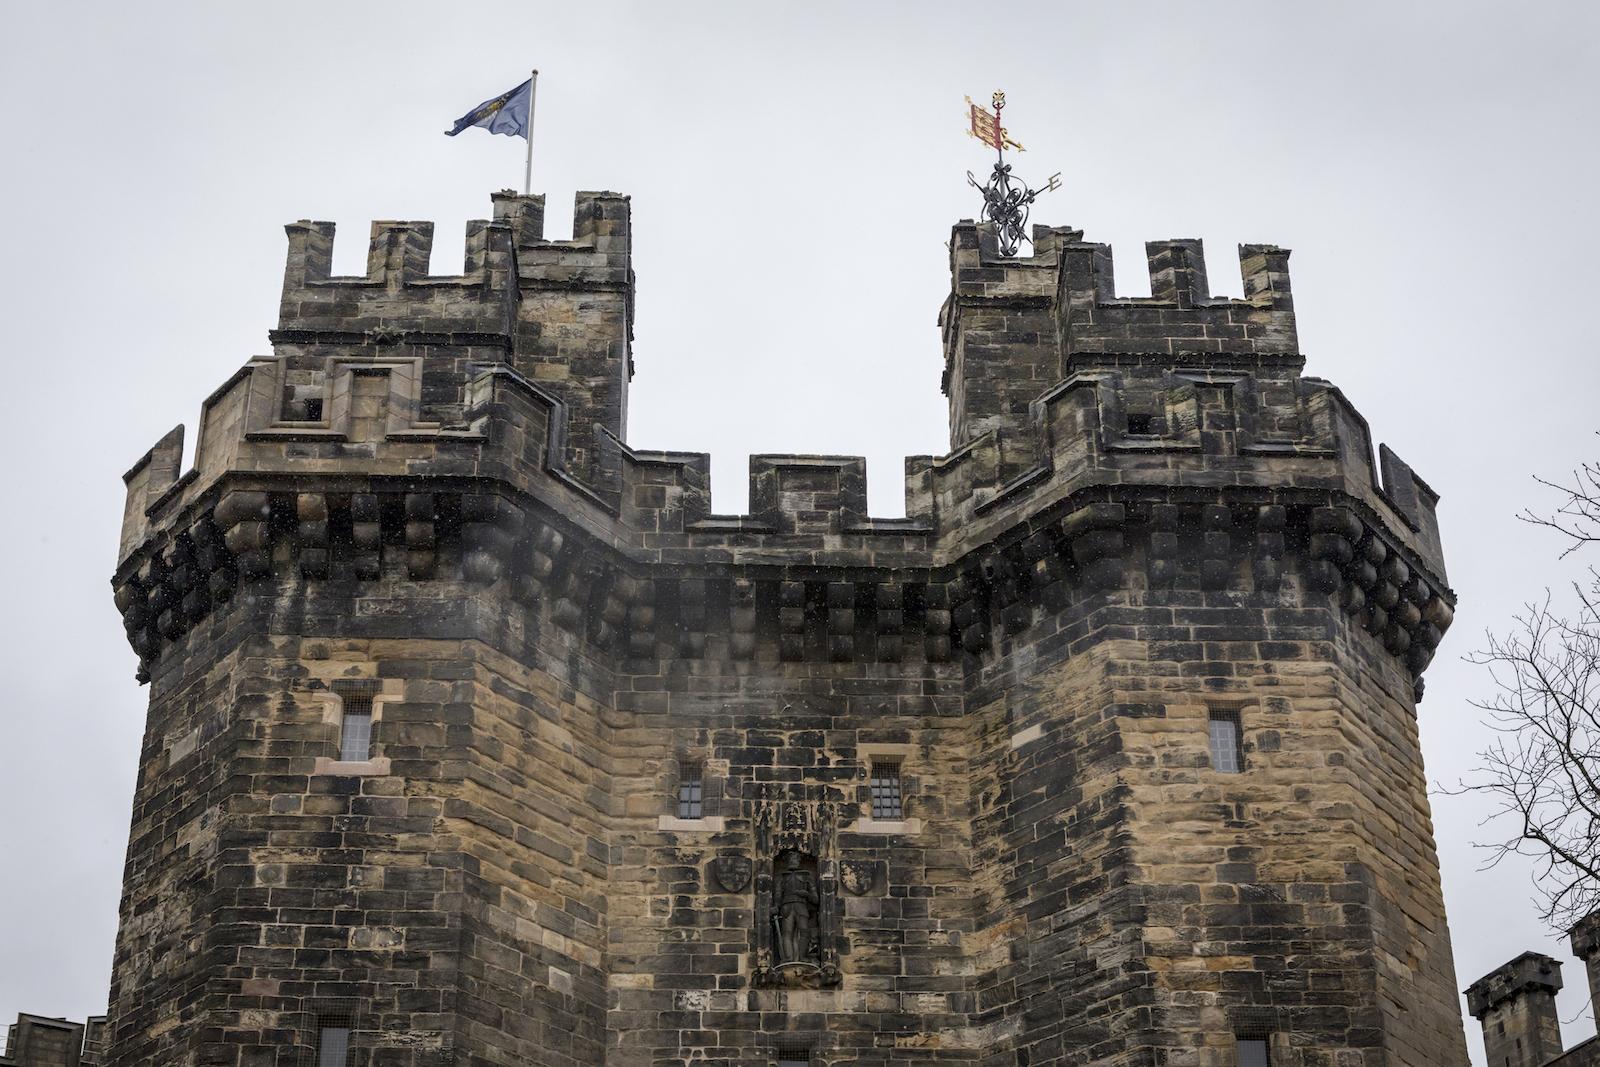 Commonwealth Flag Flies Over Lancaster Castle